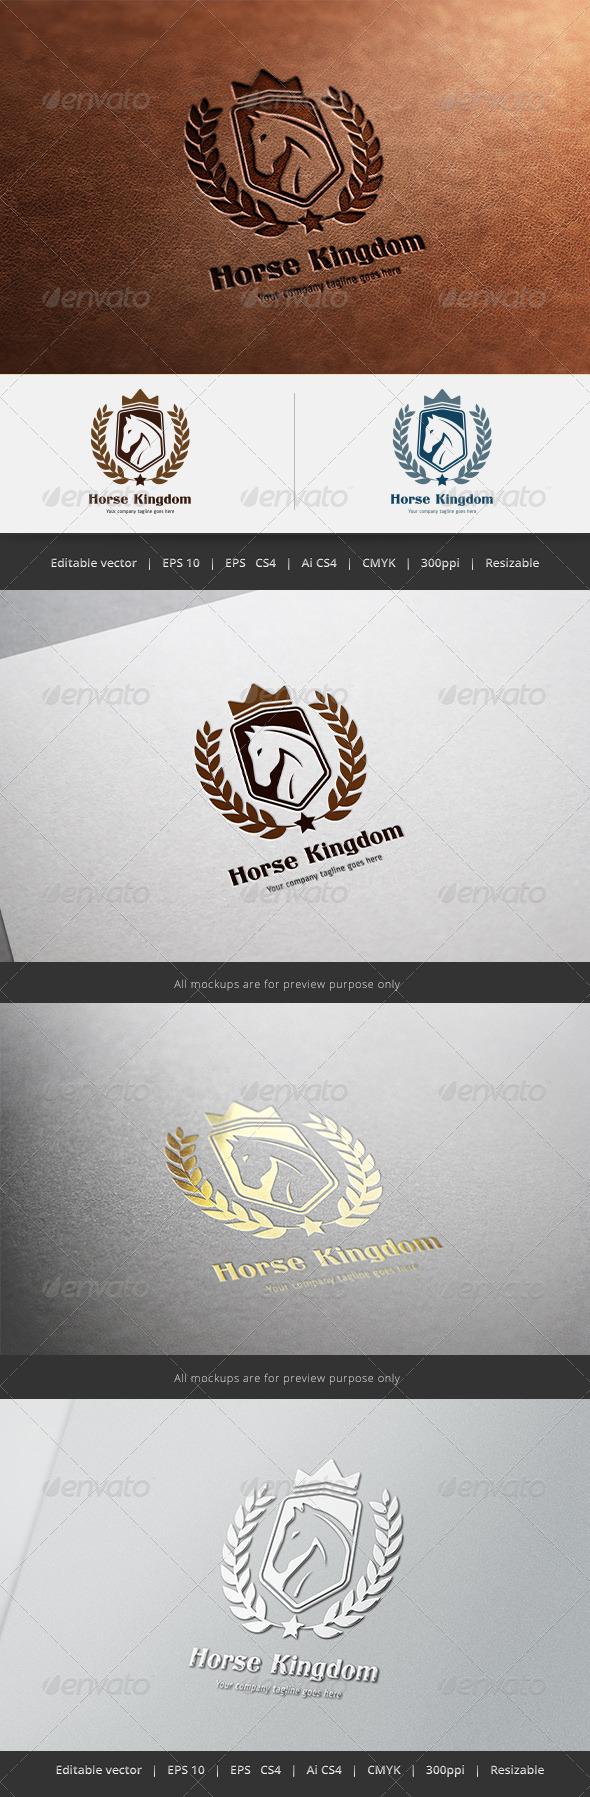 Horse Kingdom Logo - Crests Logo Templates